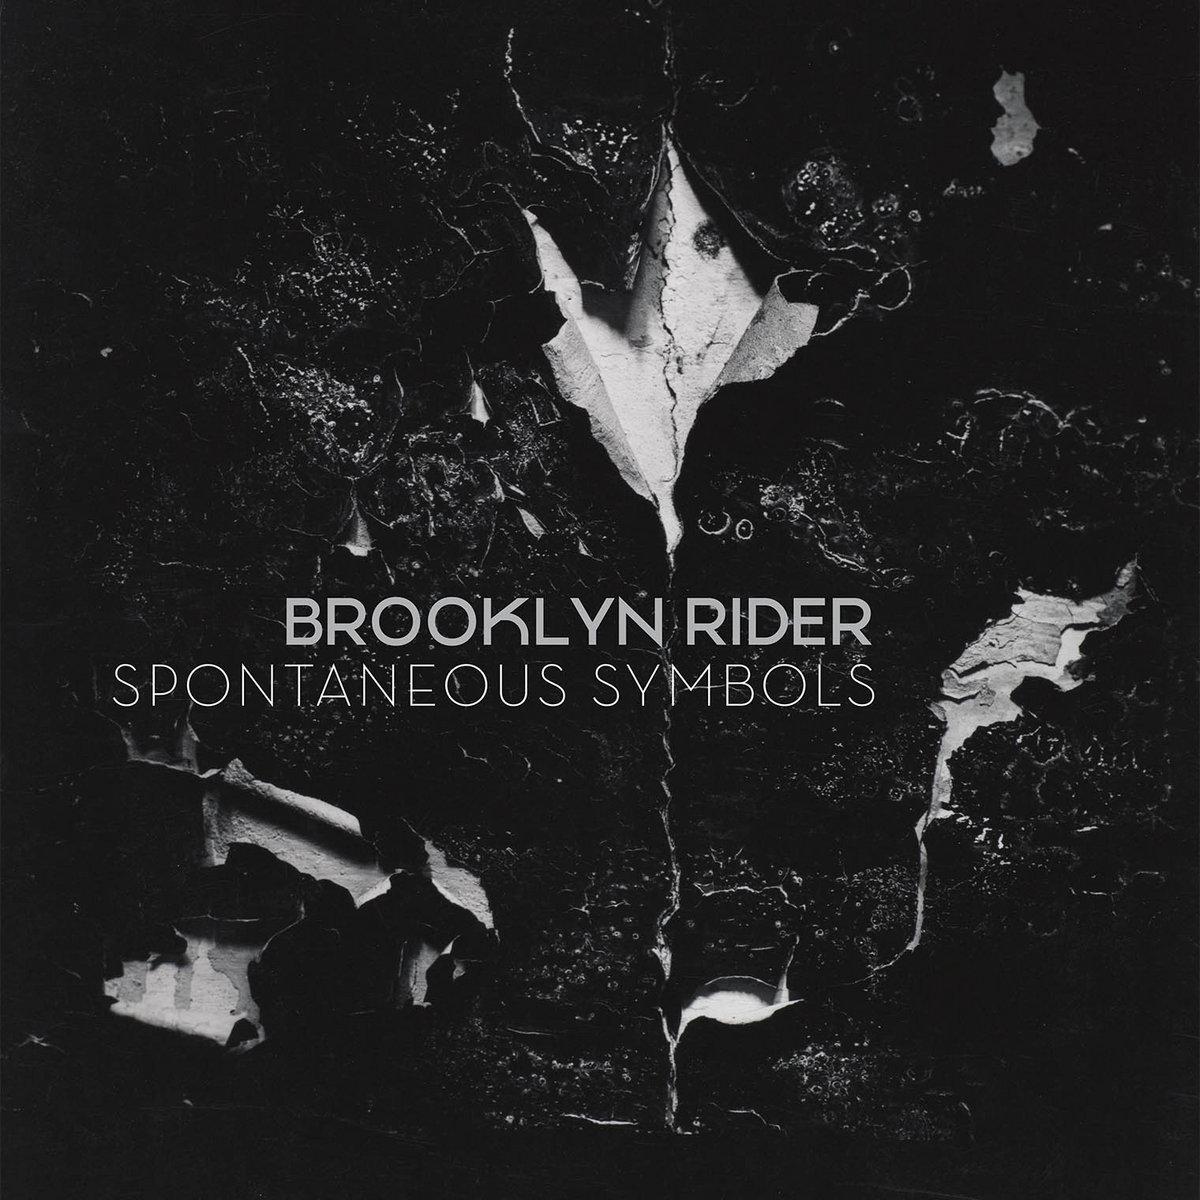 Spontaneous Symbols Brooklyn Rider